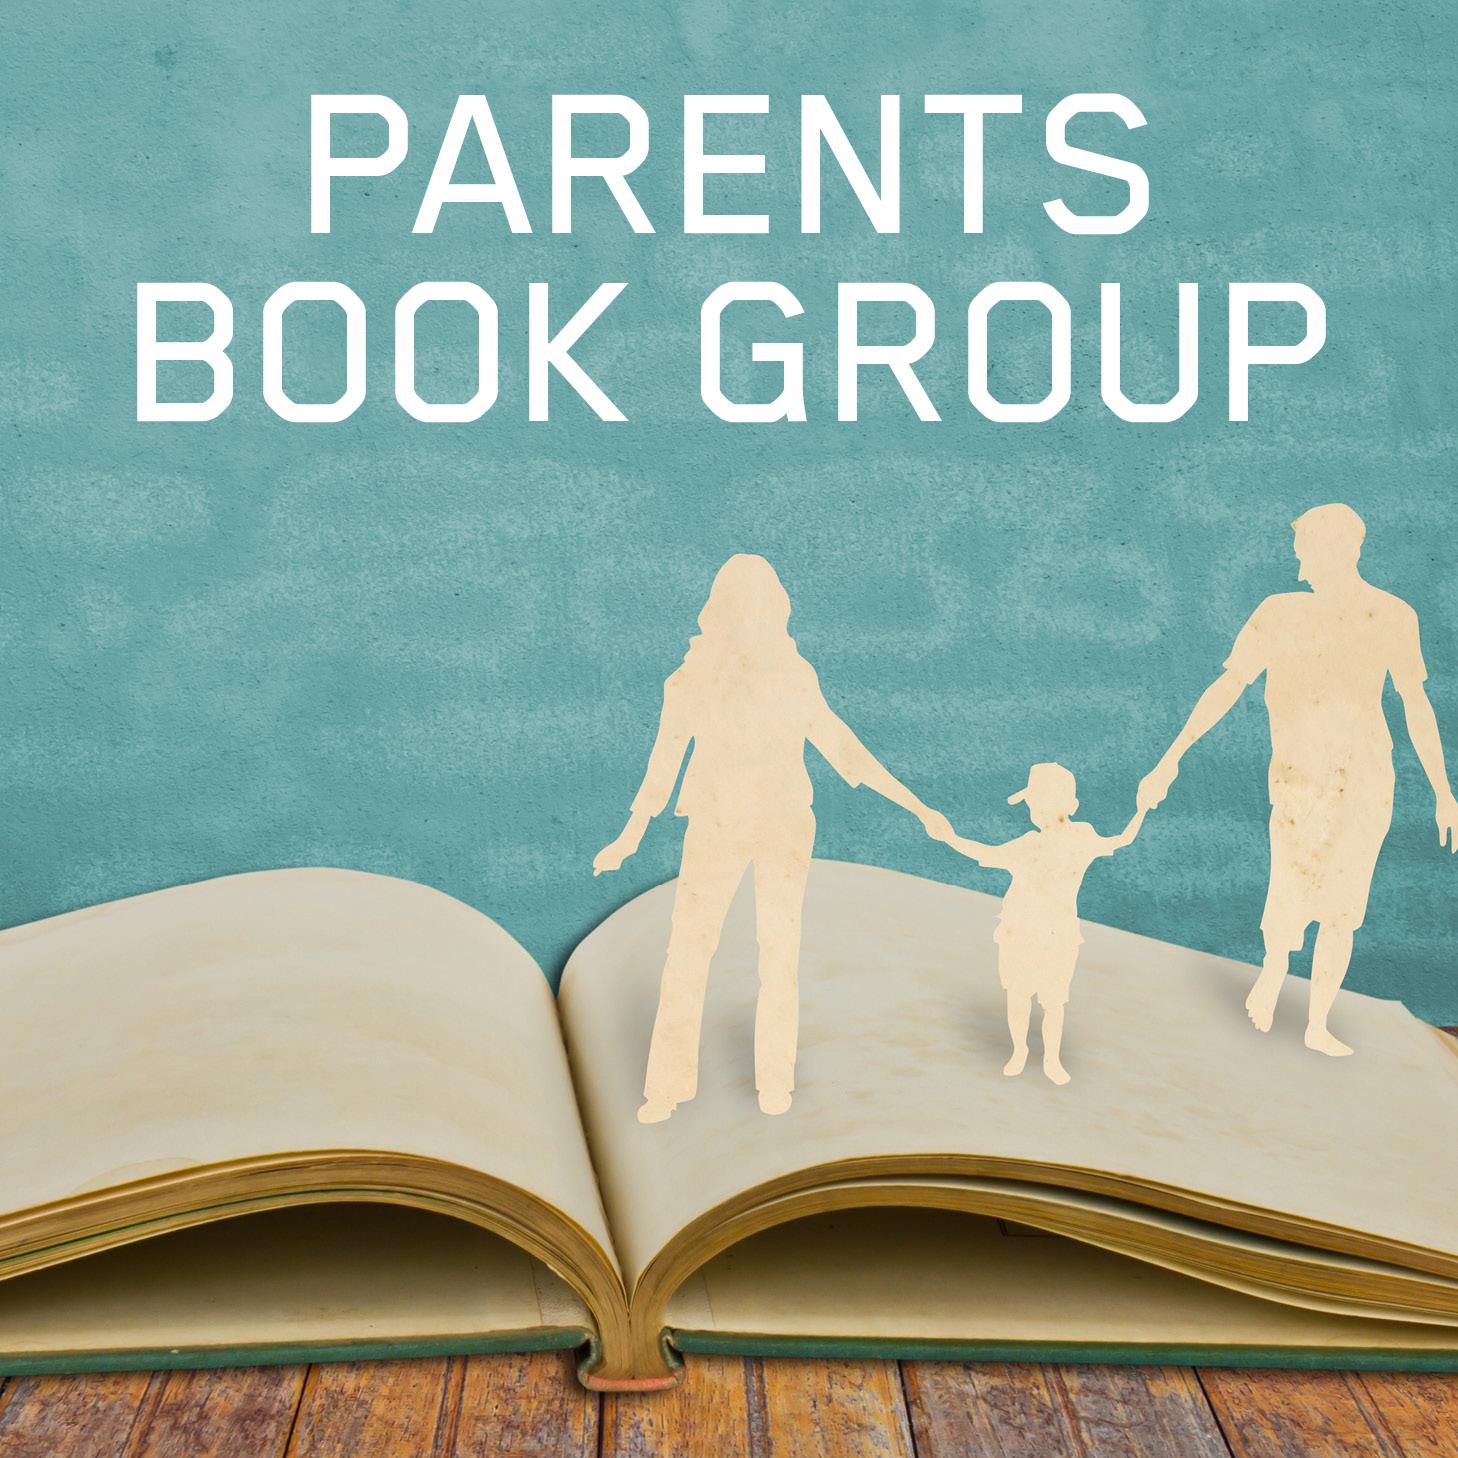 ParentsBookGroup_sq.jpg